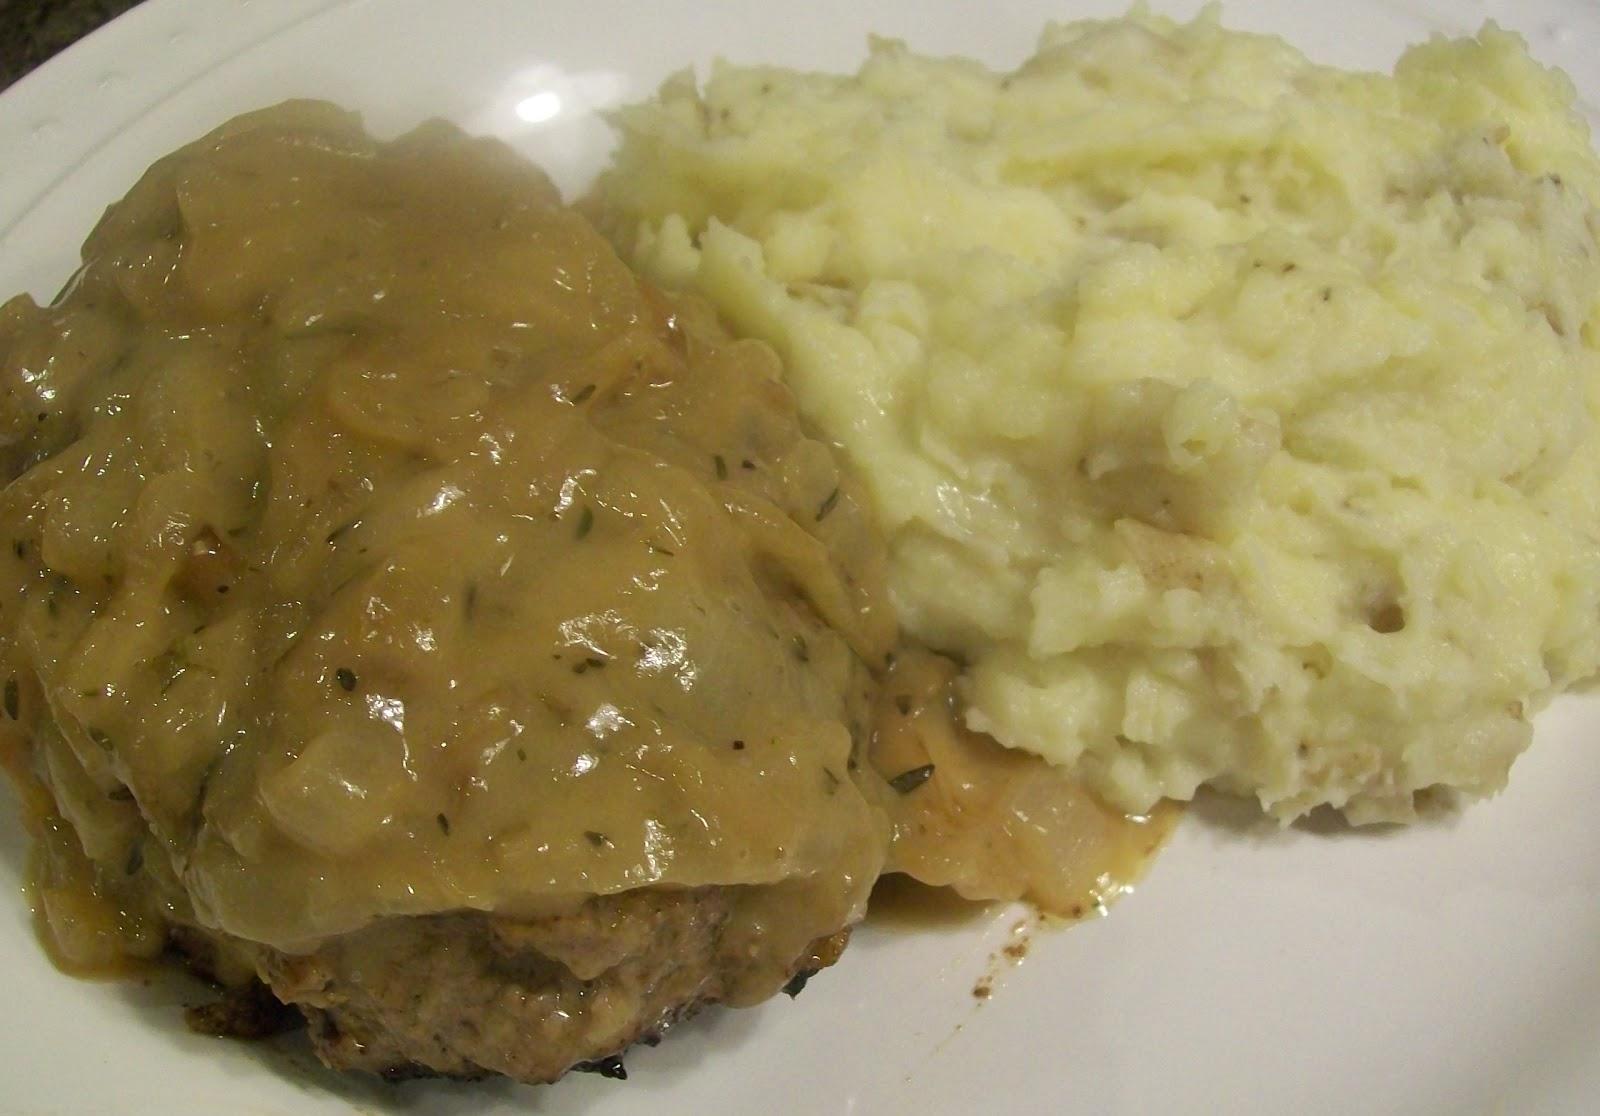 ... : Rachael Ray Wednesday - Salisbury Steaks with French Onion Gravy